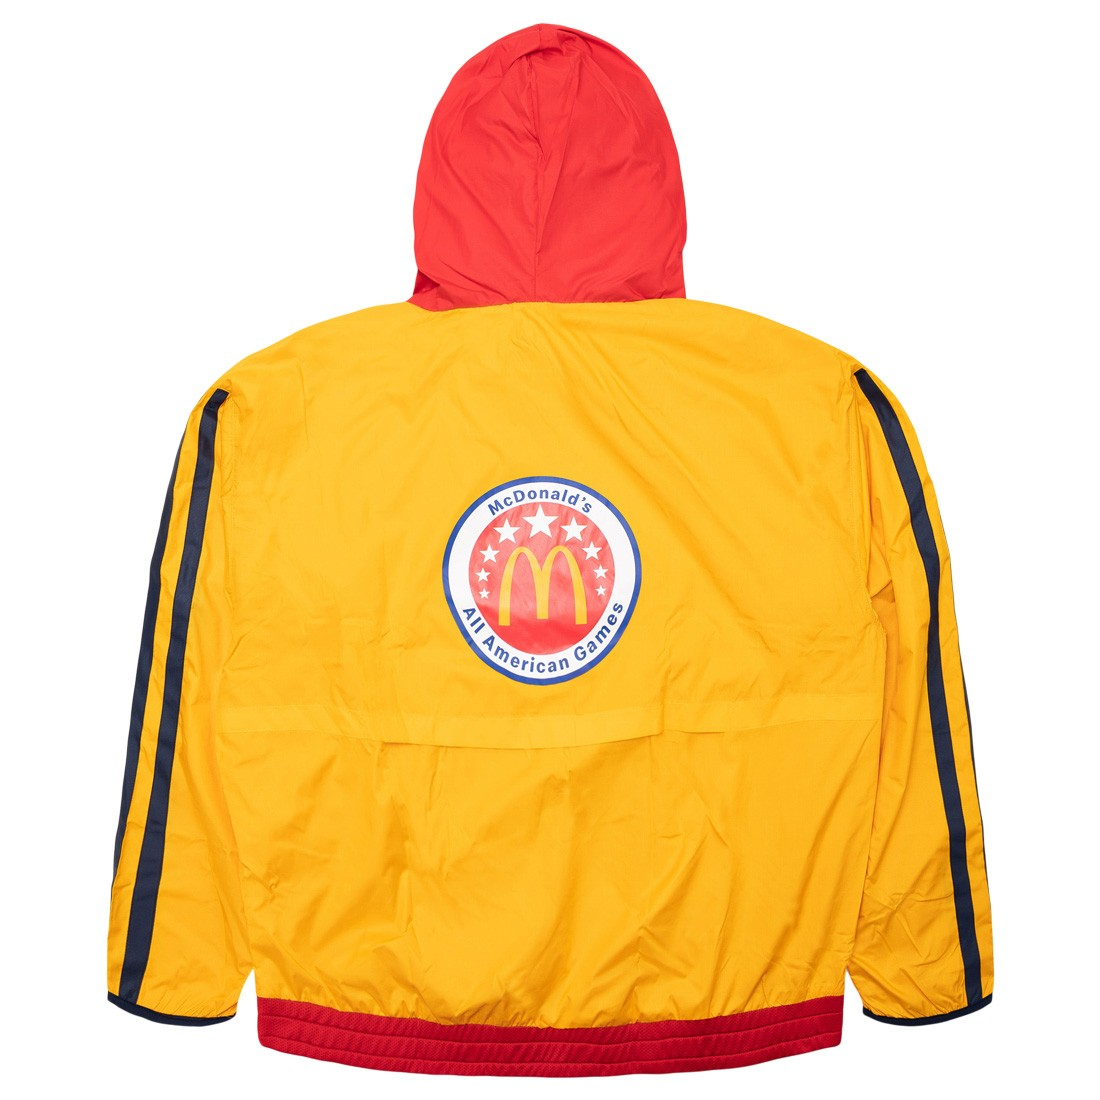 Adidas x Eric Emanuel Men McDonald's All American Game Hoodie (yellow / athletic yellow)